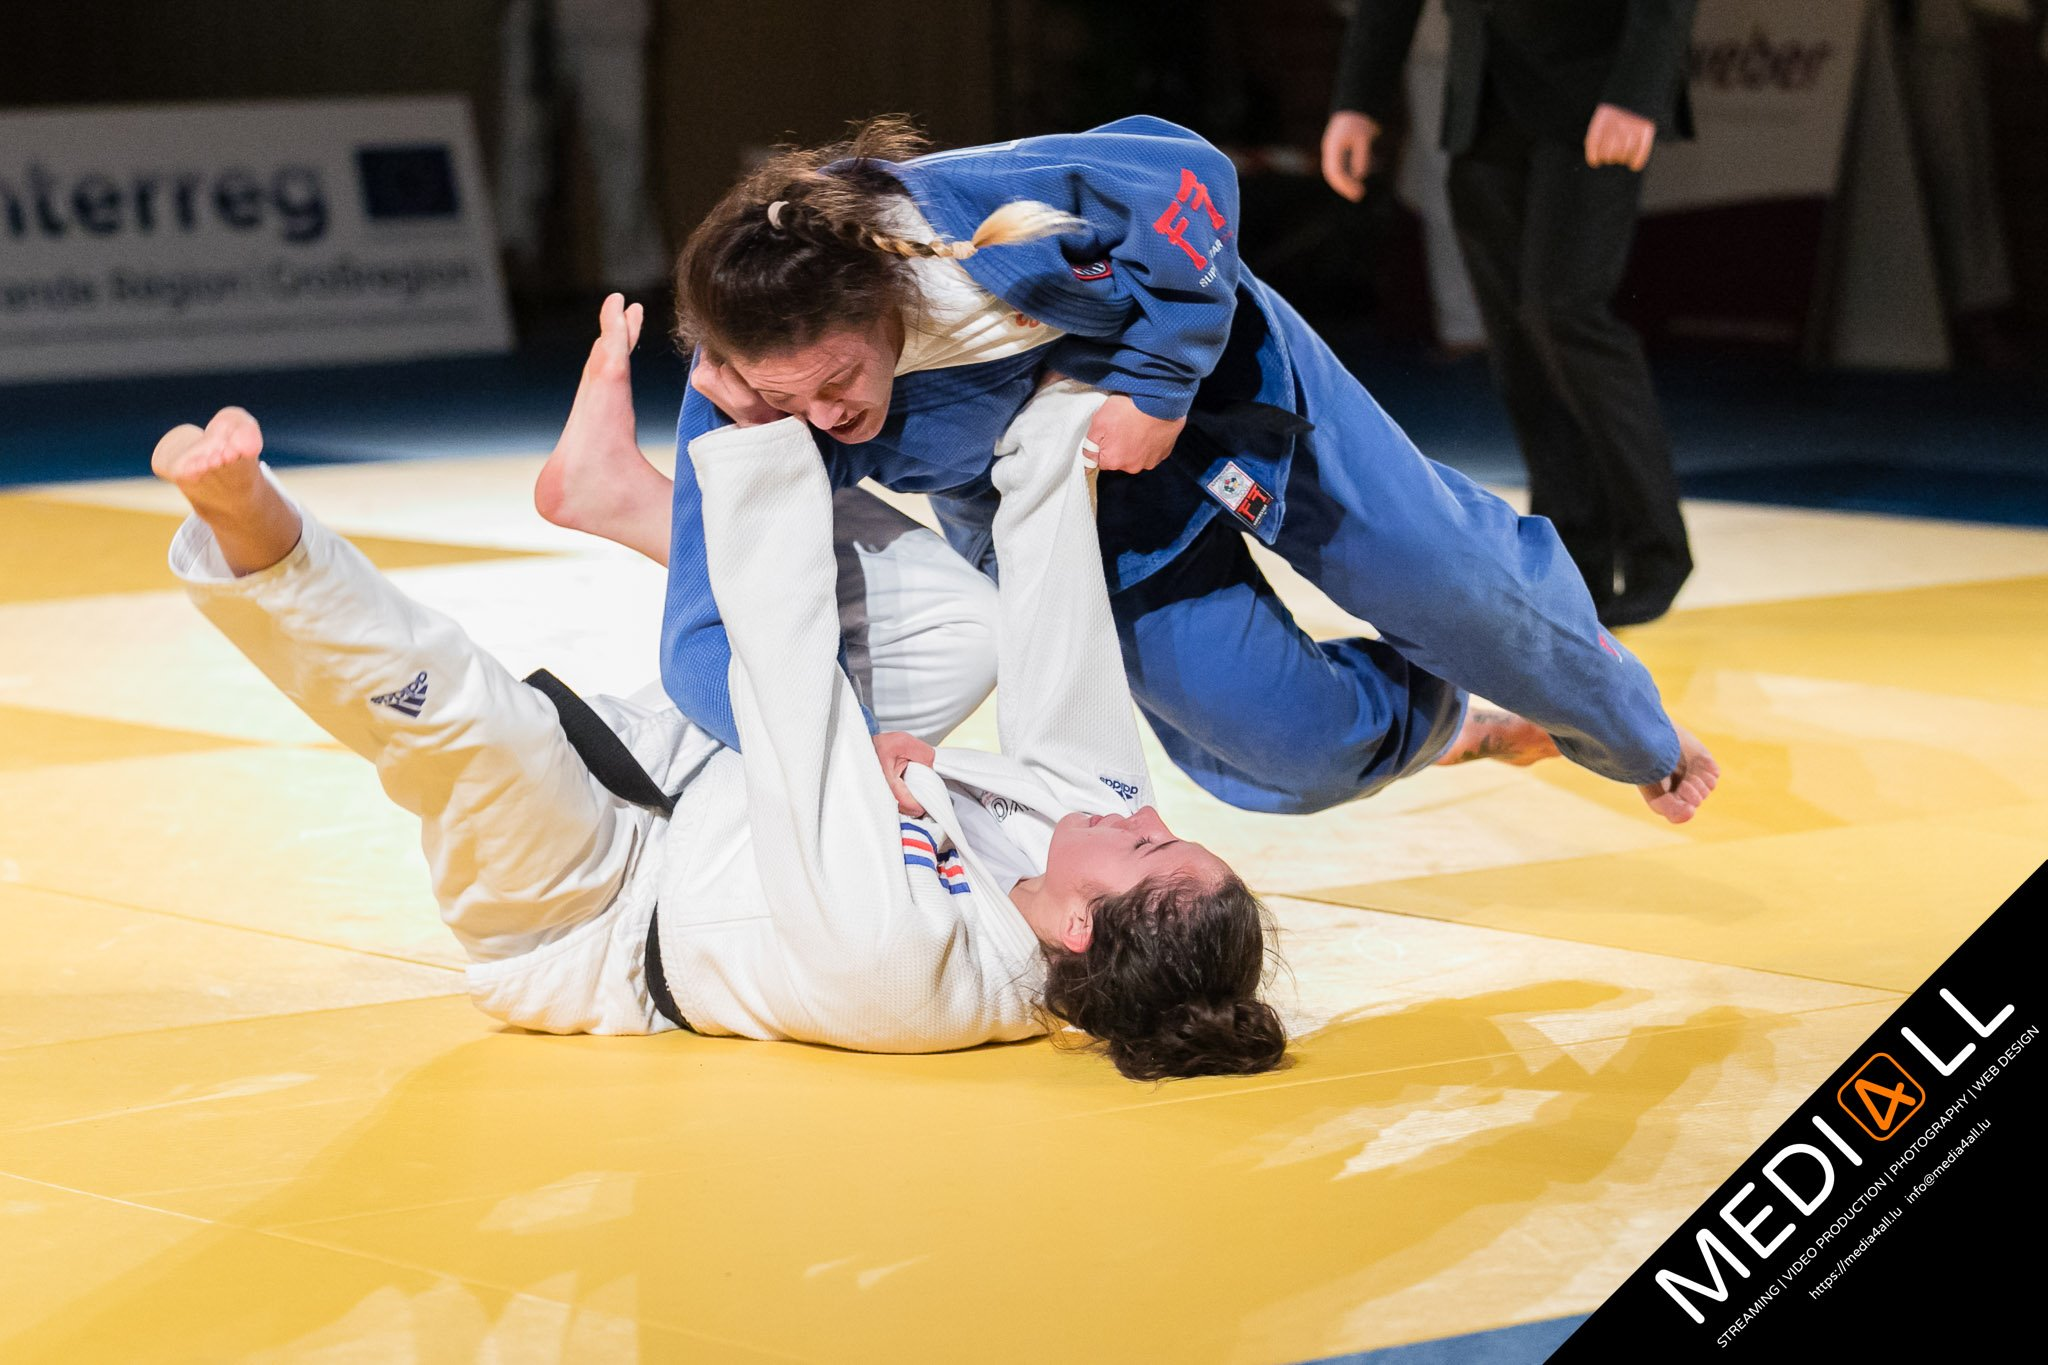 Senior Interreg Judo Team Championships 2019